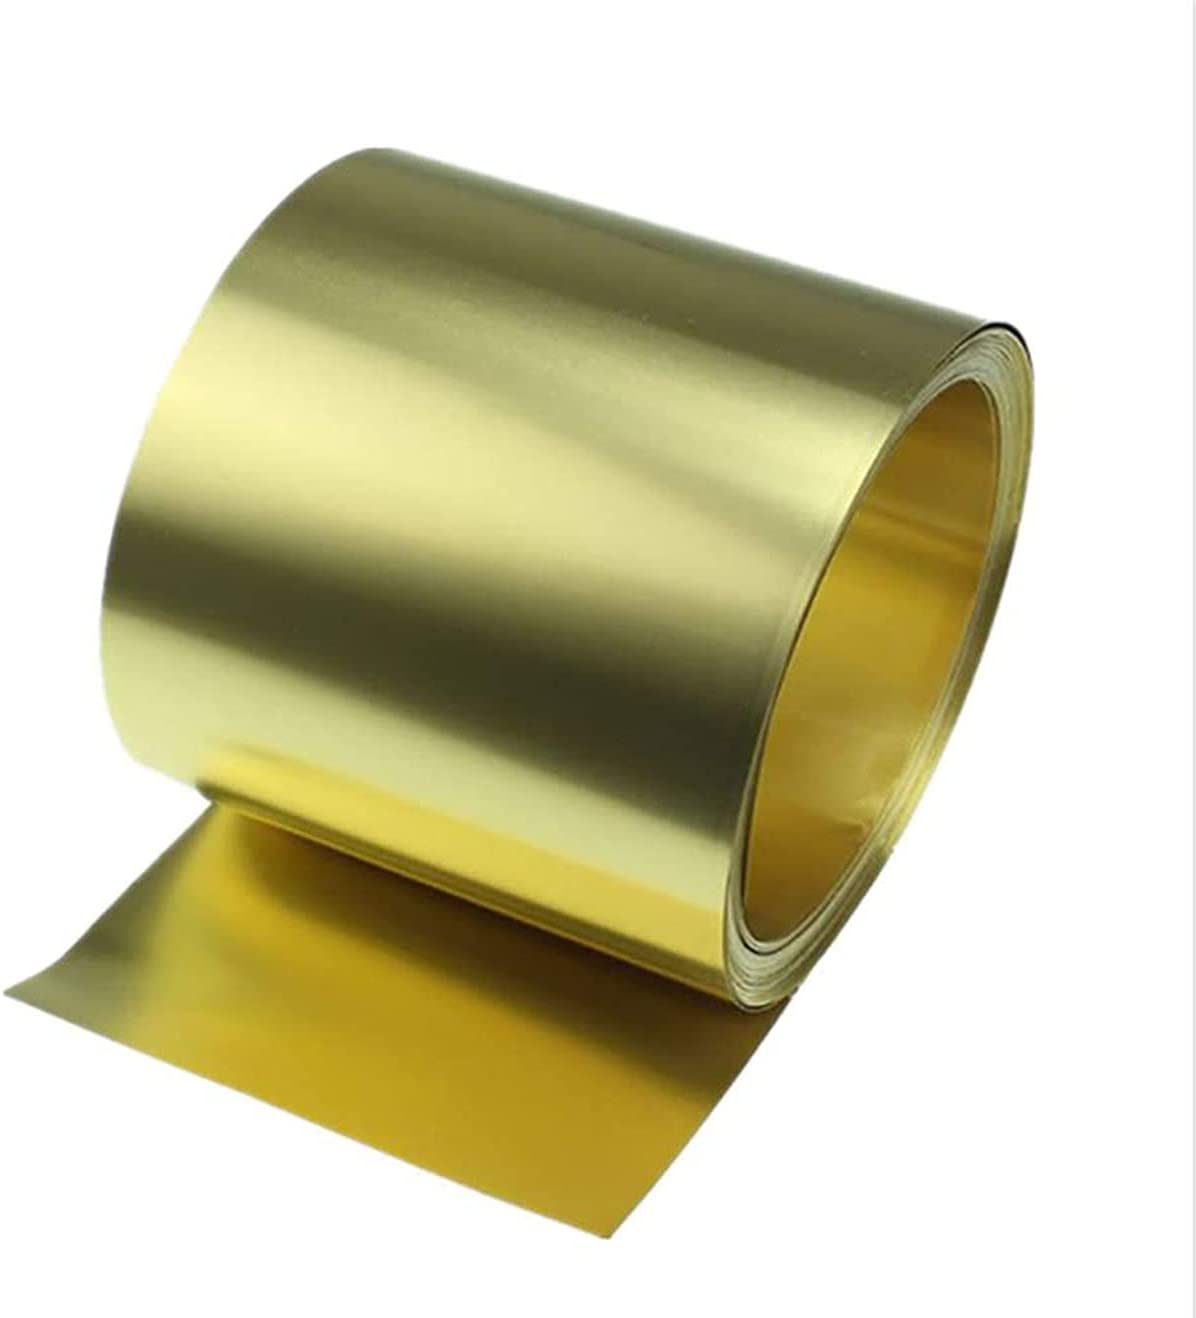 LEISHENT H62 Branded shipfree goods Brass Metal Thin Sheet 0.7X200x1000mm